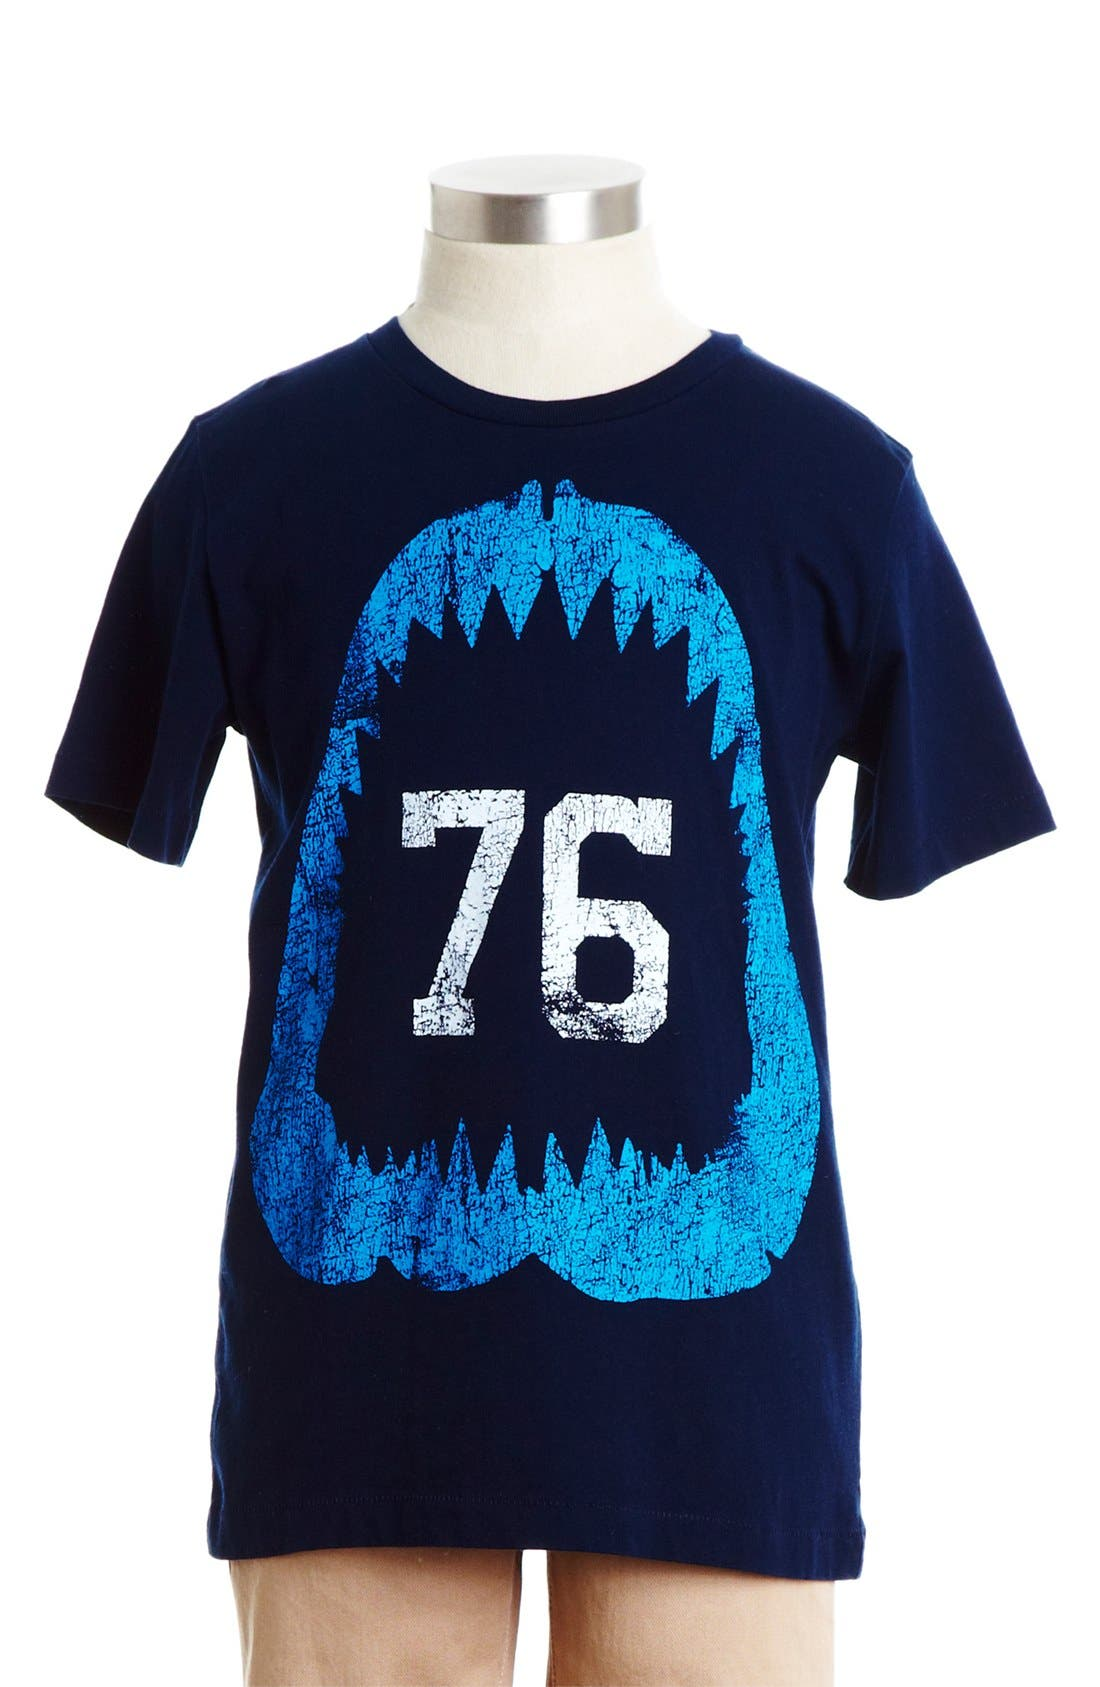 Main Image - Peek 'Chomp Shark' Cotton T-Shirt (Toddler Boys, Little Boys & Big Boys)